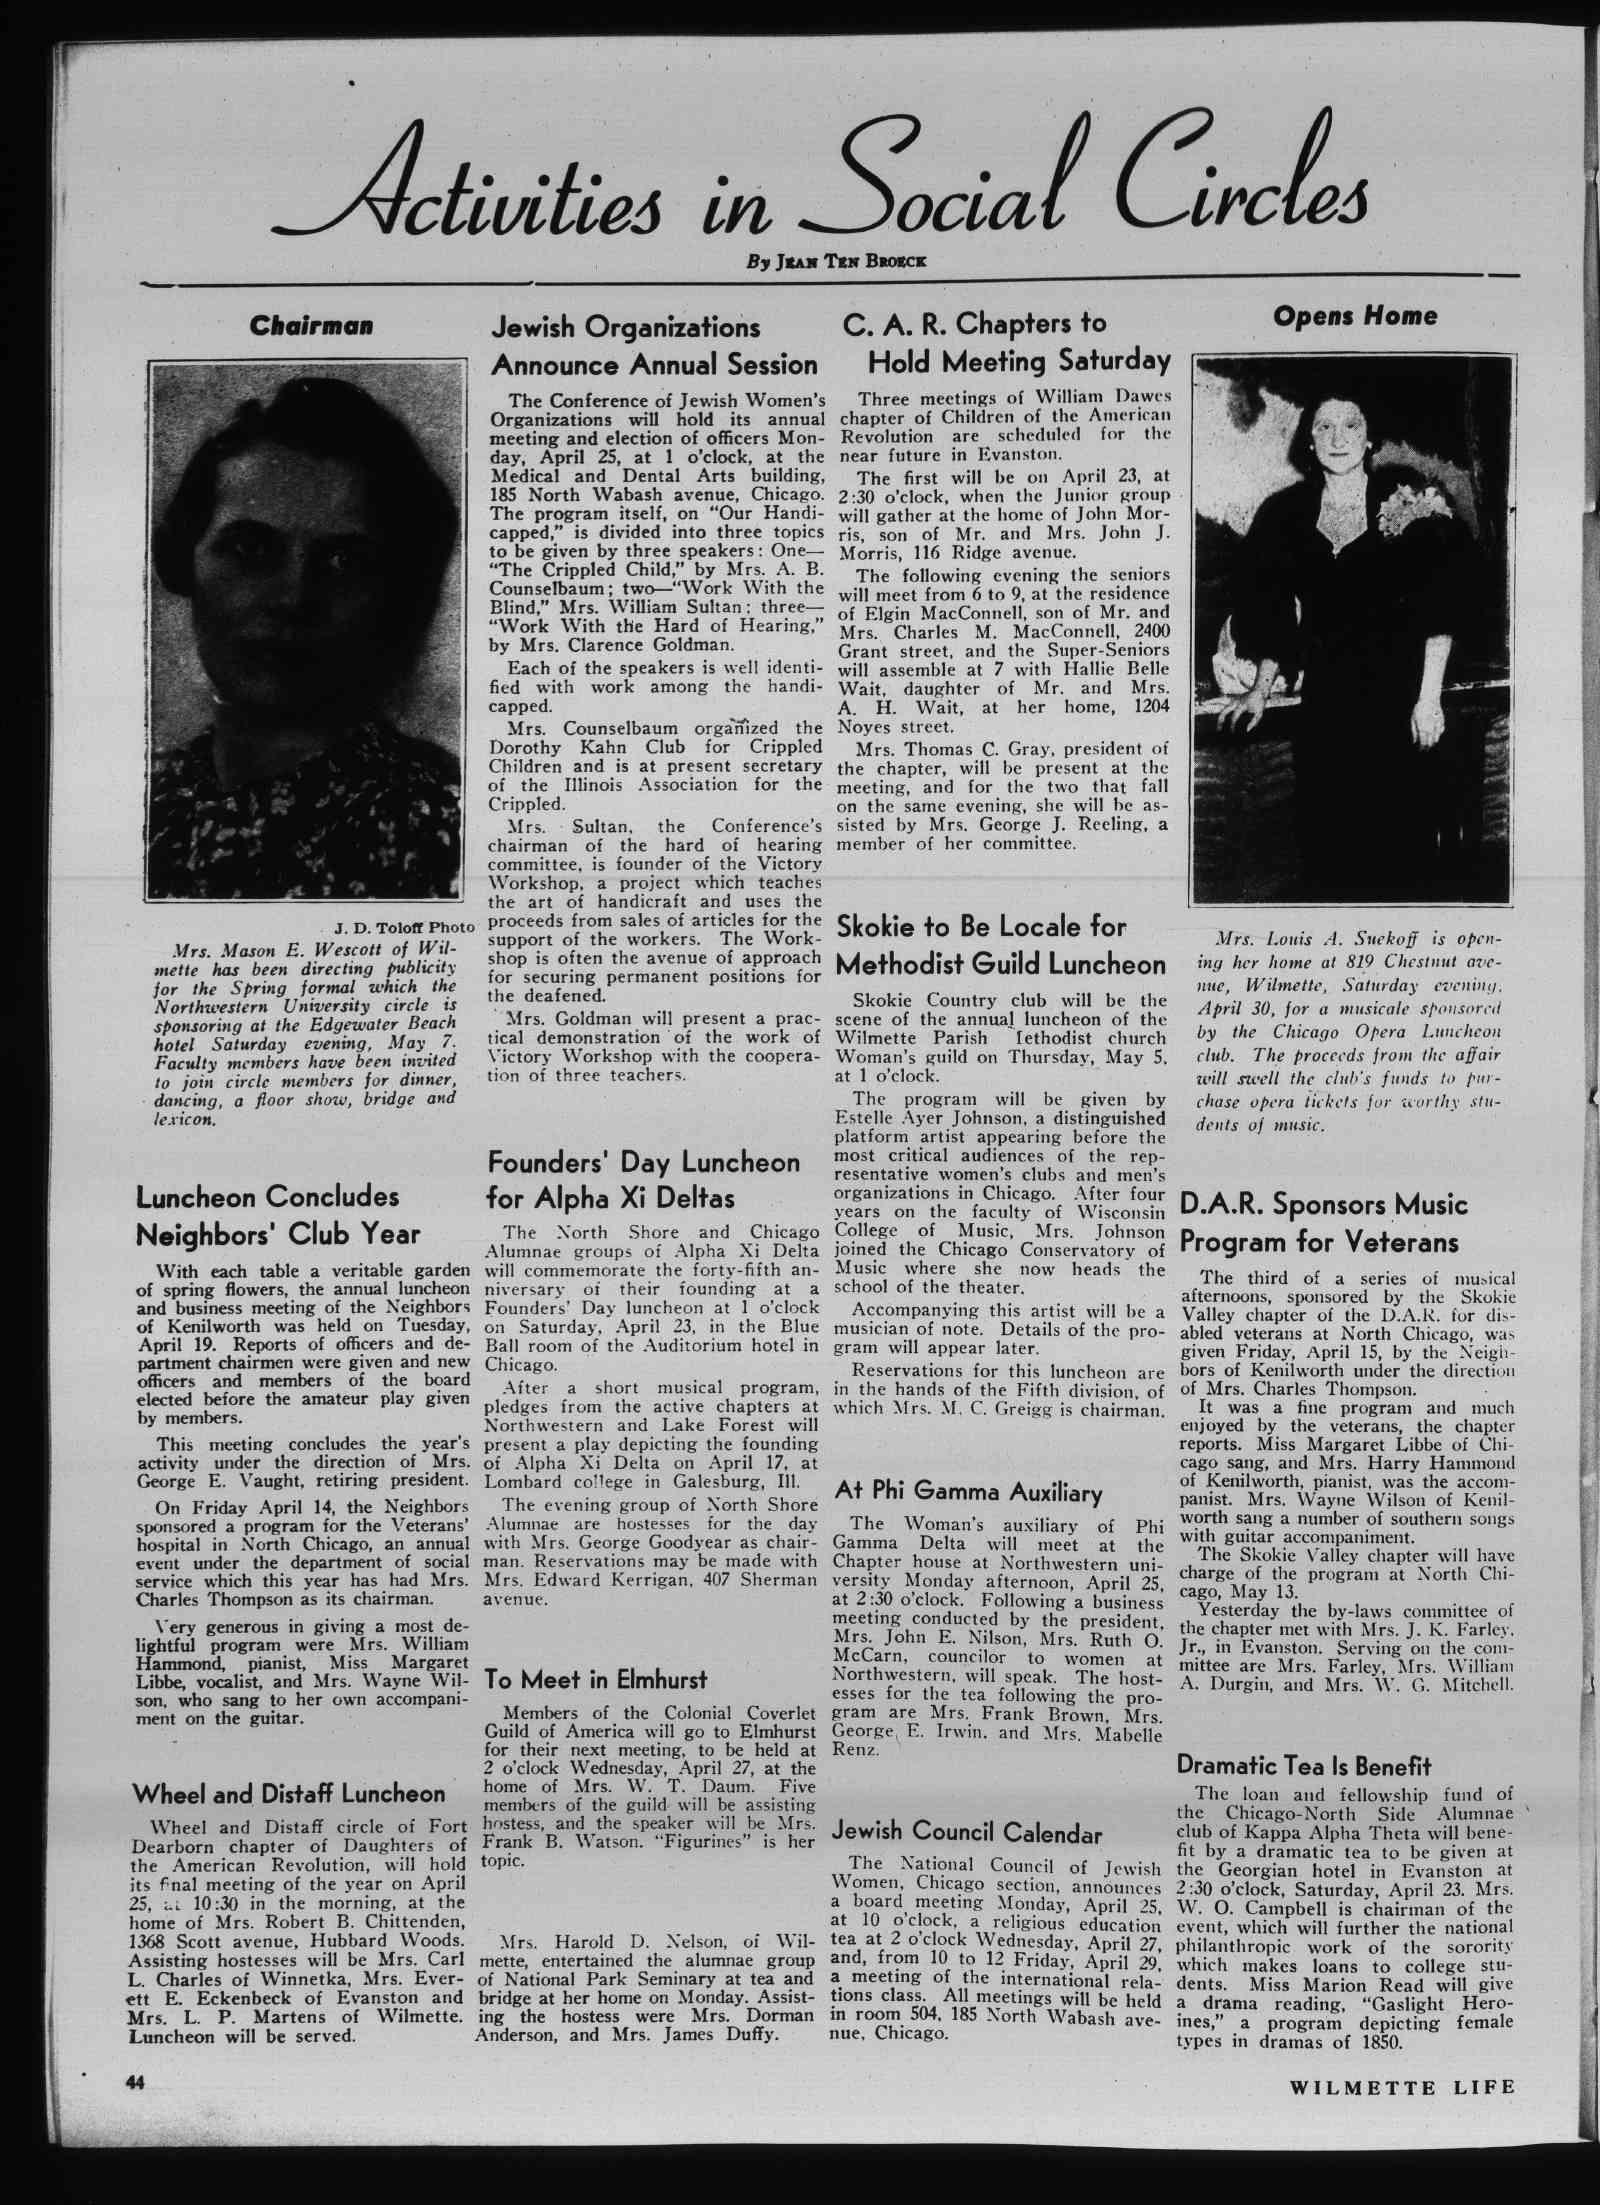 Wilmette Life (Wilmette, Illinois), 21 Apr 1938